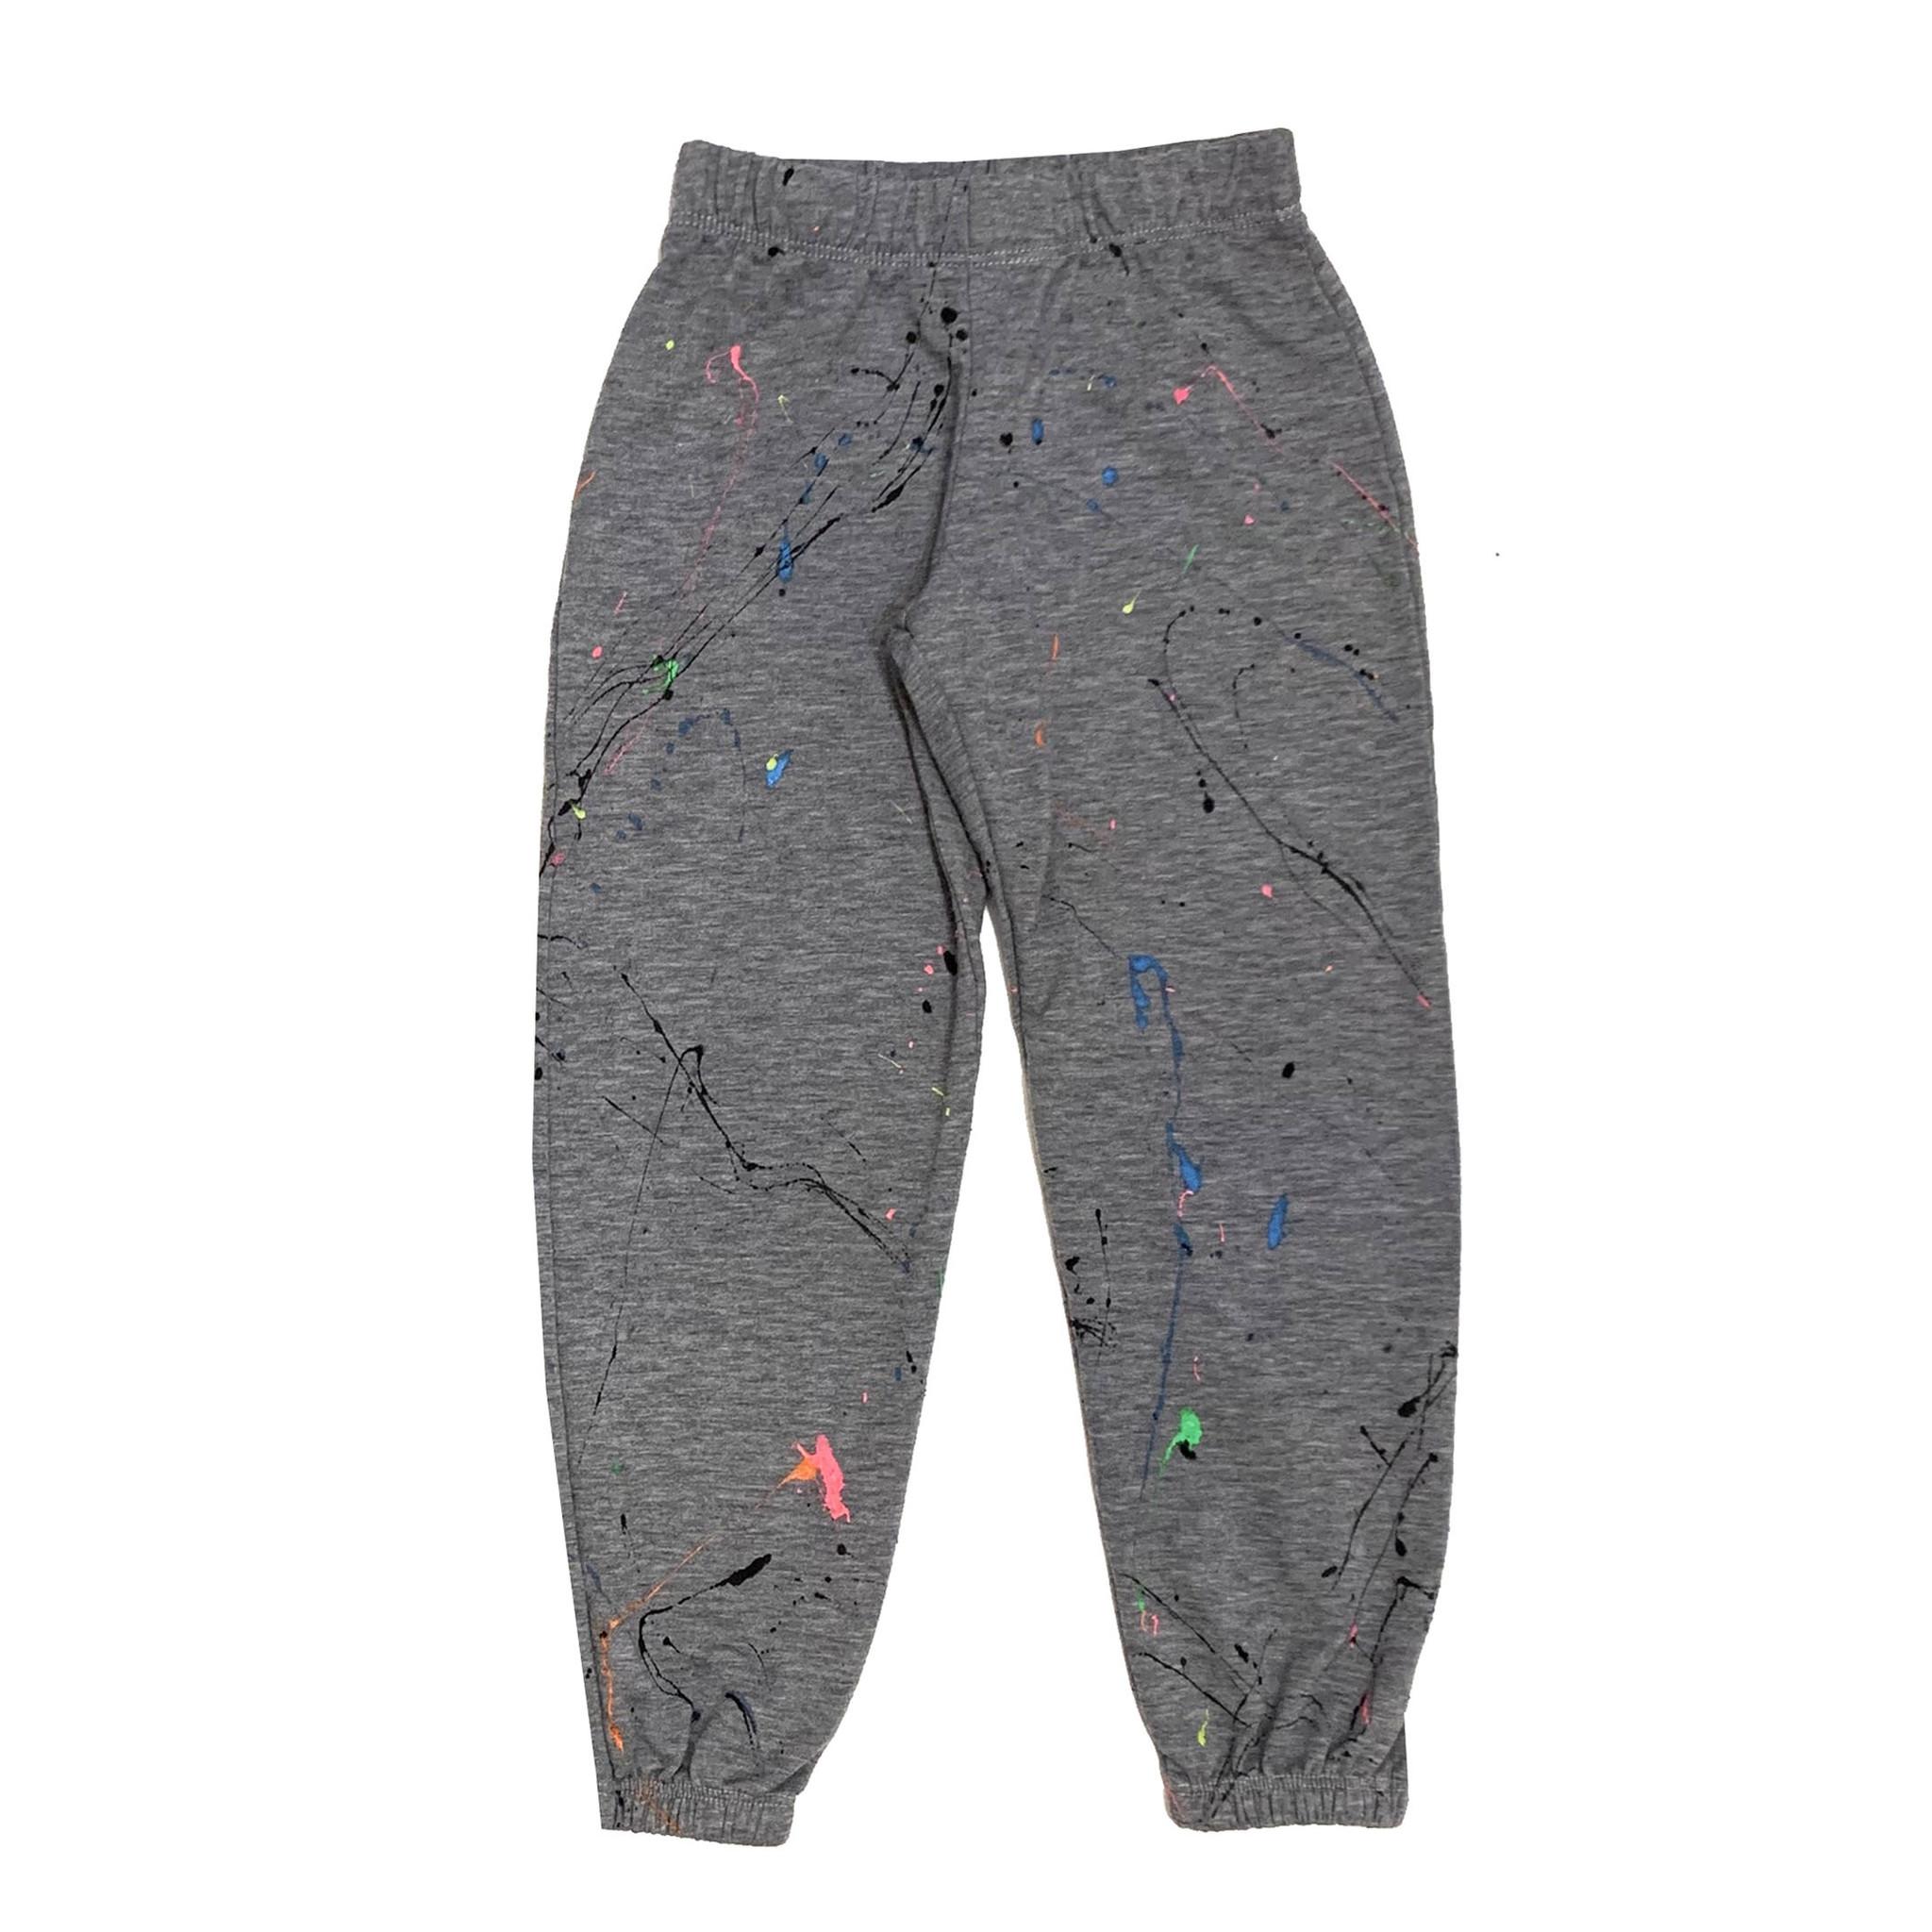 Grey Sweatpant with Rainbow Splatter Paint